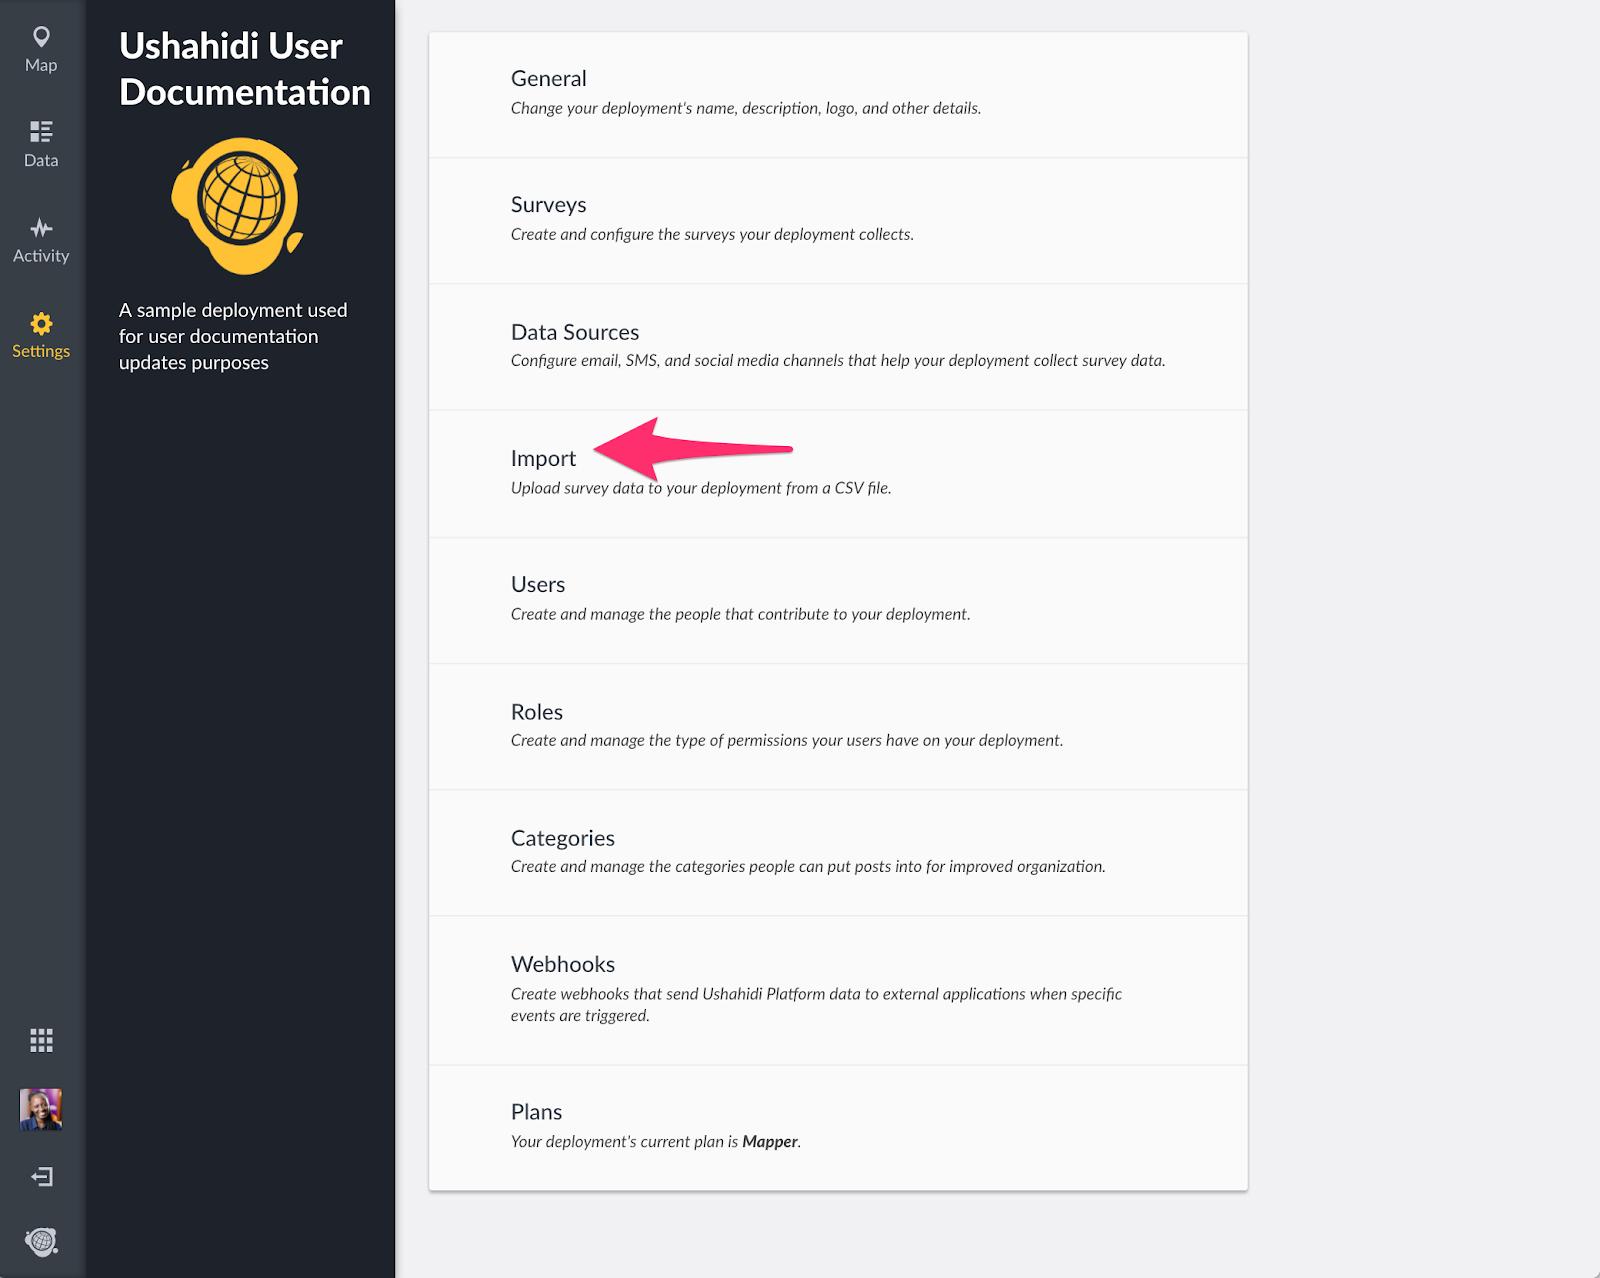 Support - Ushahidi